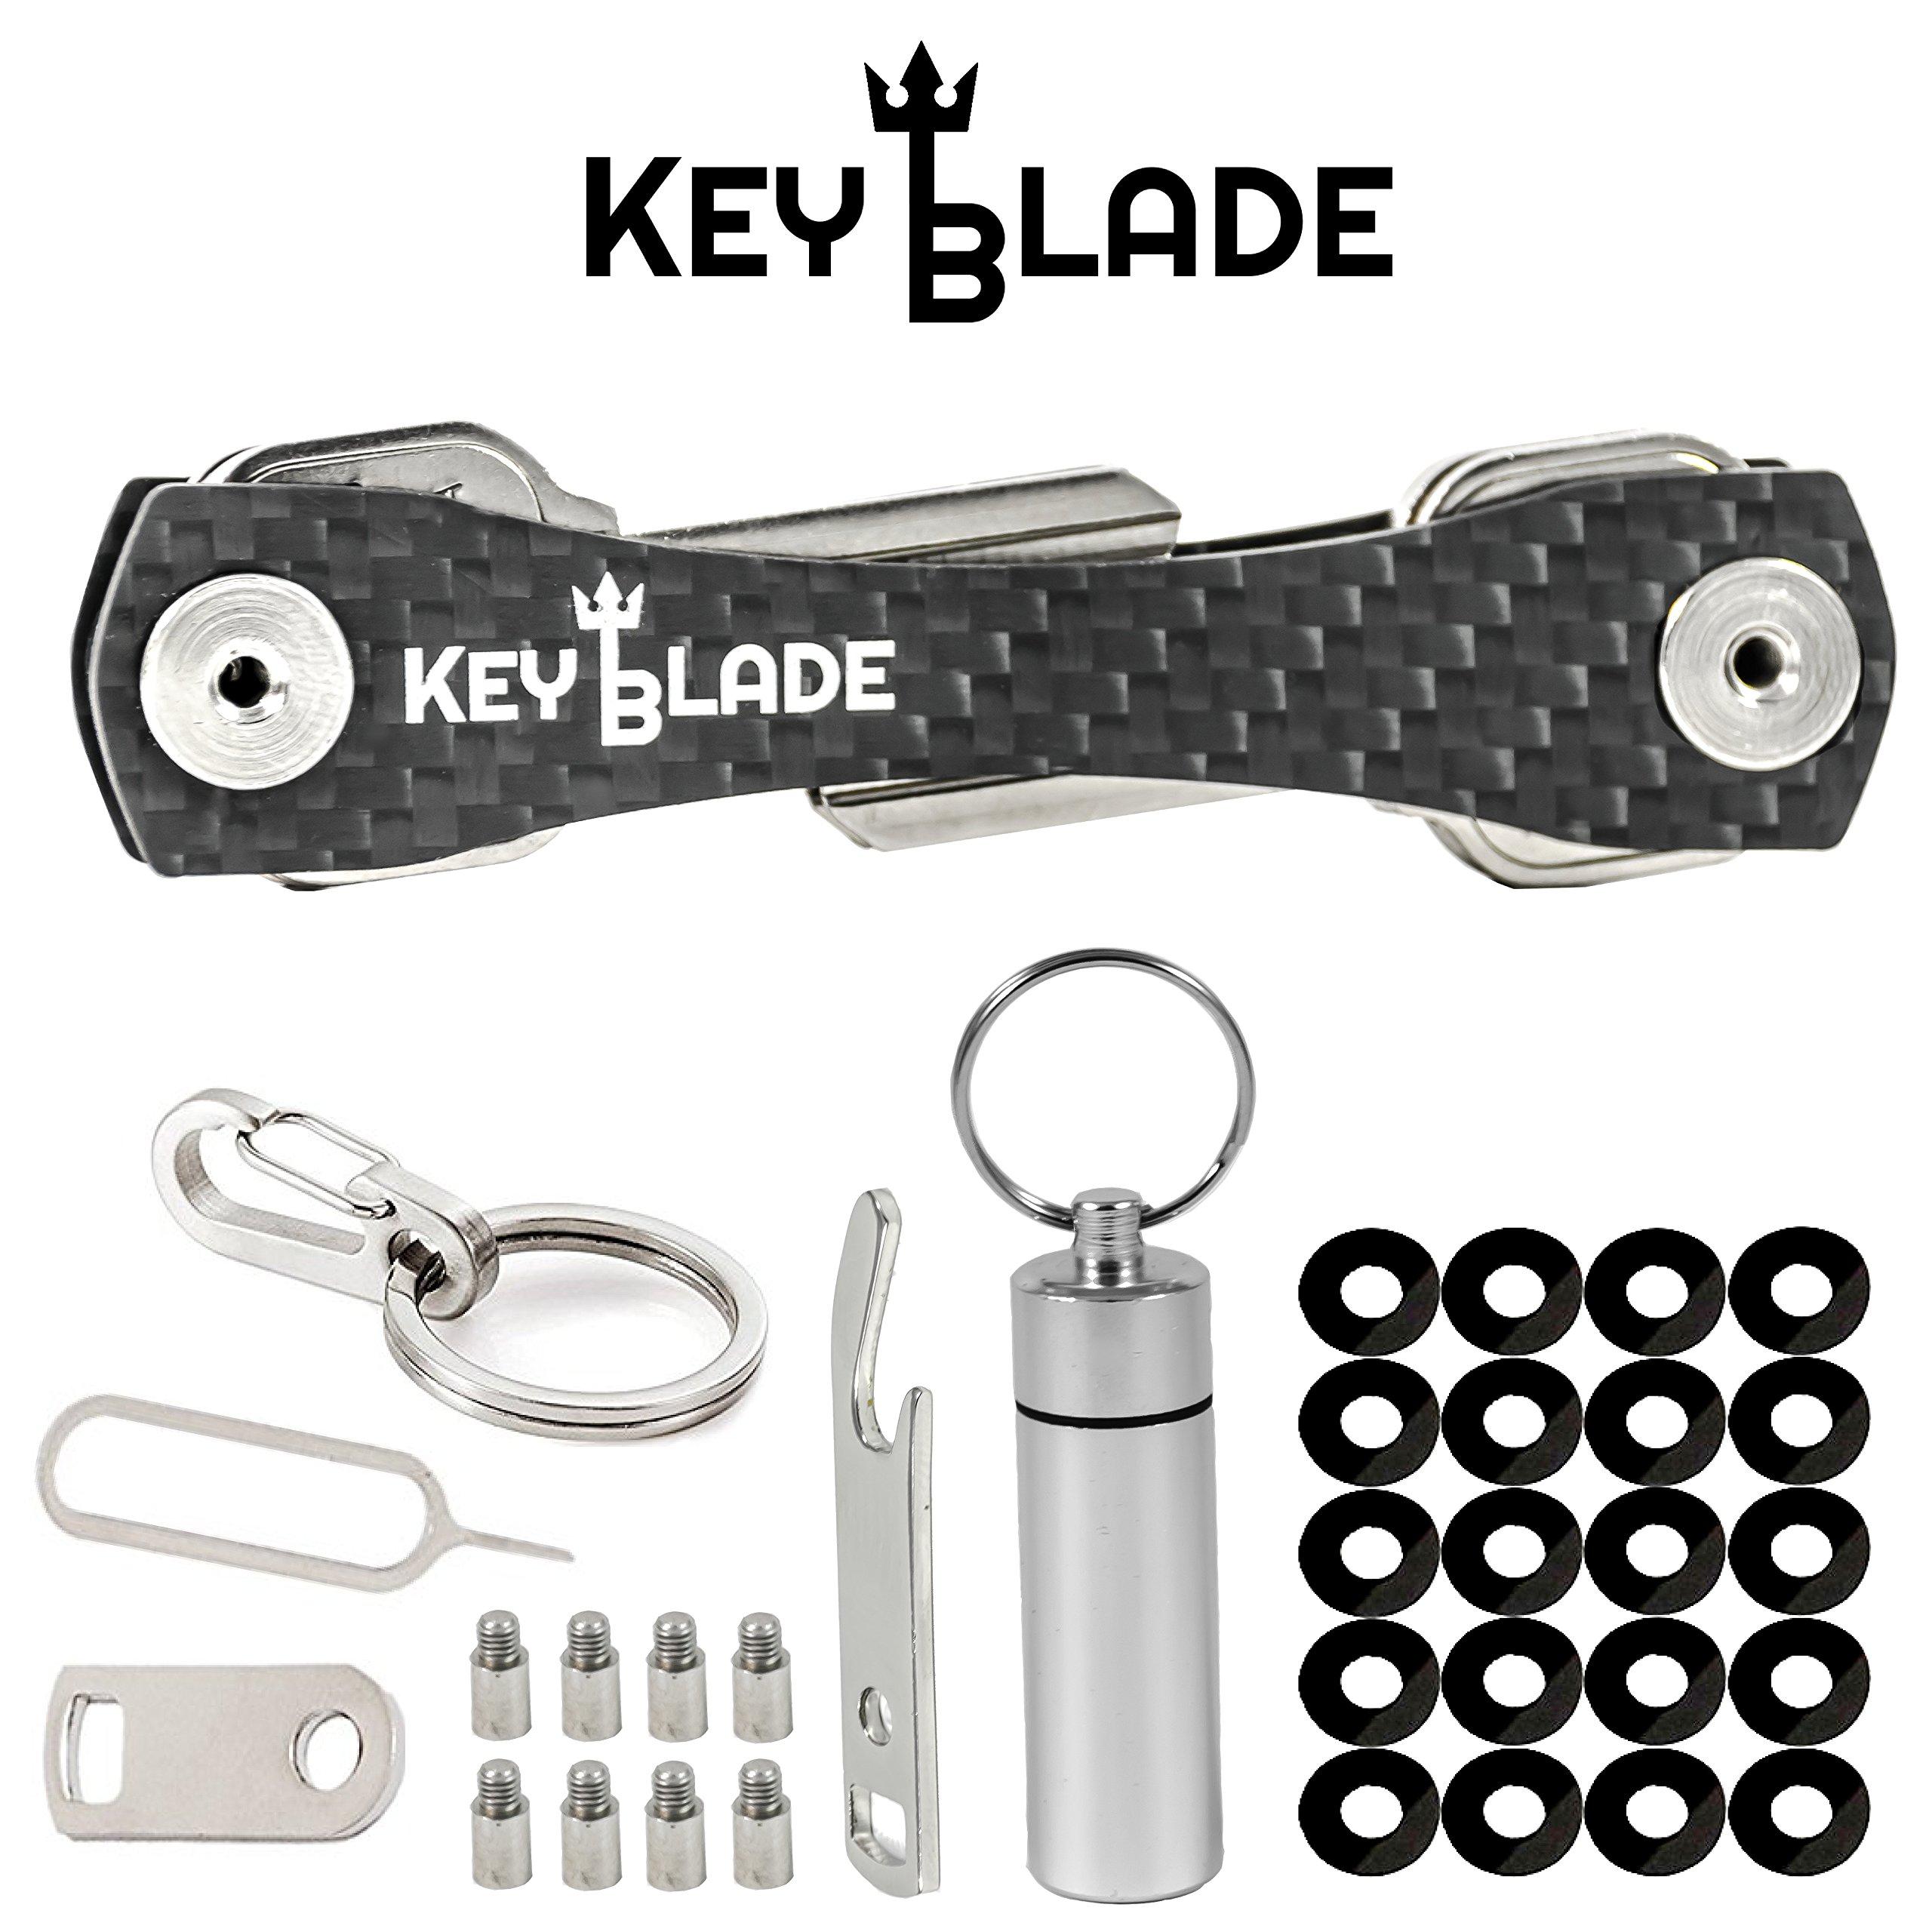 Keyblade Carbon Key Holder Keychain- Smart Compact Pocket Keys Organizer up to 24 Keys- Lightweight & Durable- Free Bottle Opener, Carabiner, More- Made of Carbon Fiber & Stainless Steel